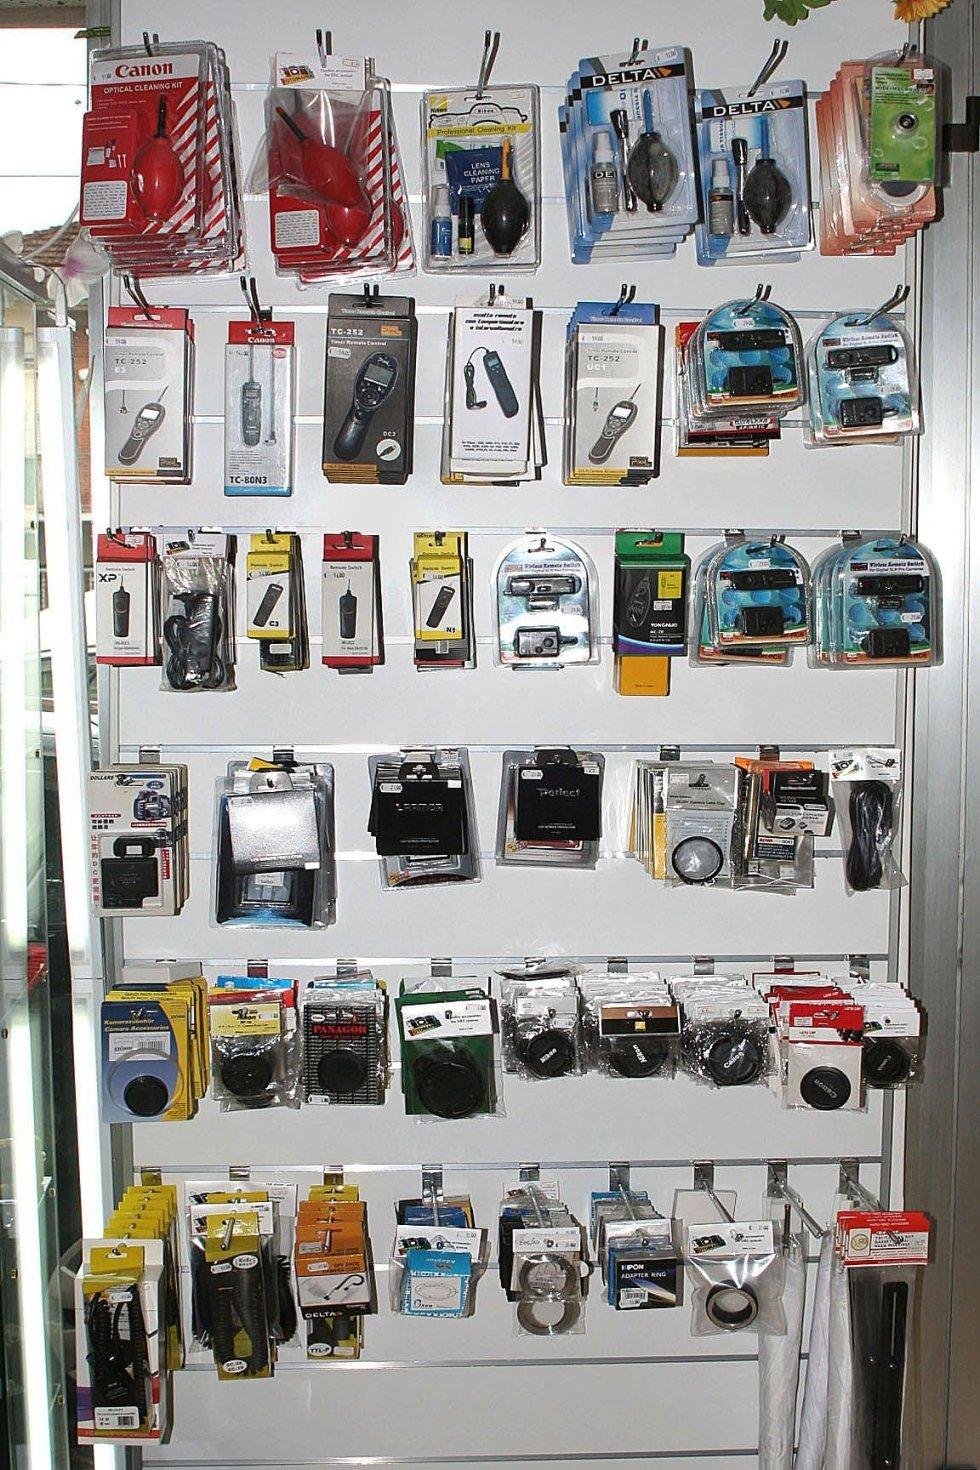 Kit pulizie, telecomandi, tappi, cavi ttl